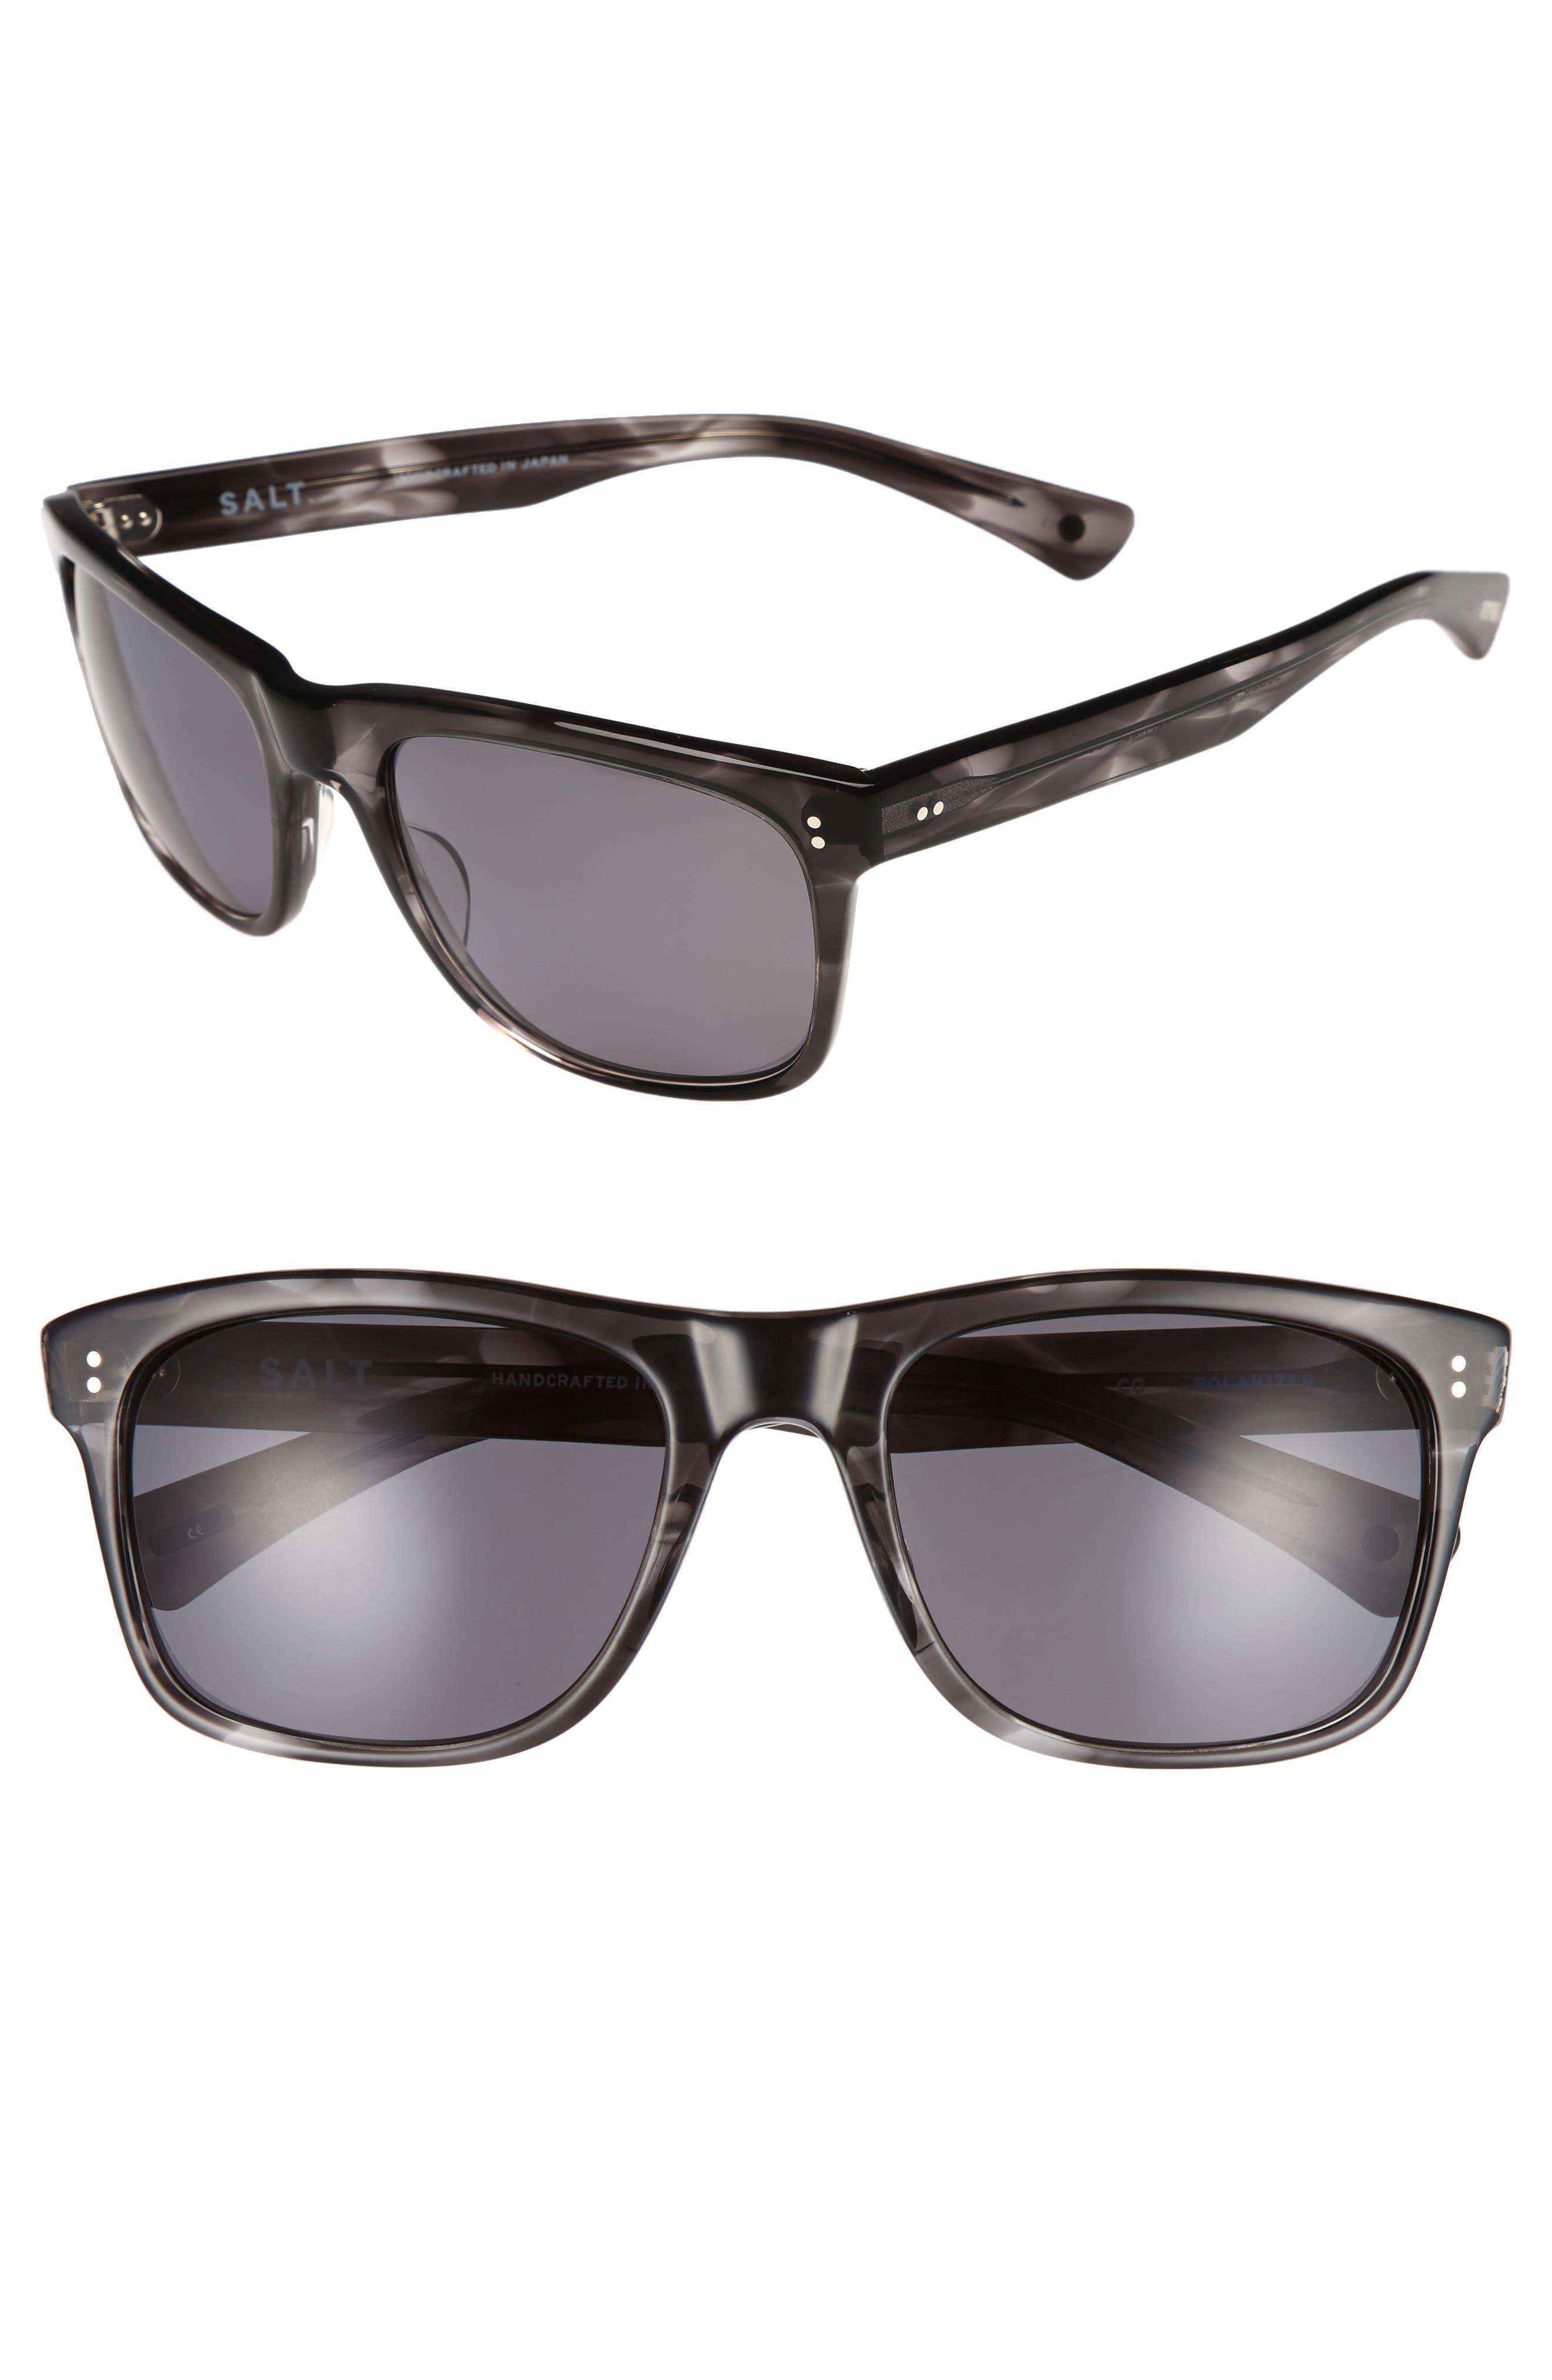 Tufnel 52mm Polarized Sunglasses,                         Main,                         color, COLD GREY